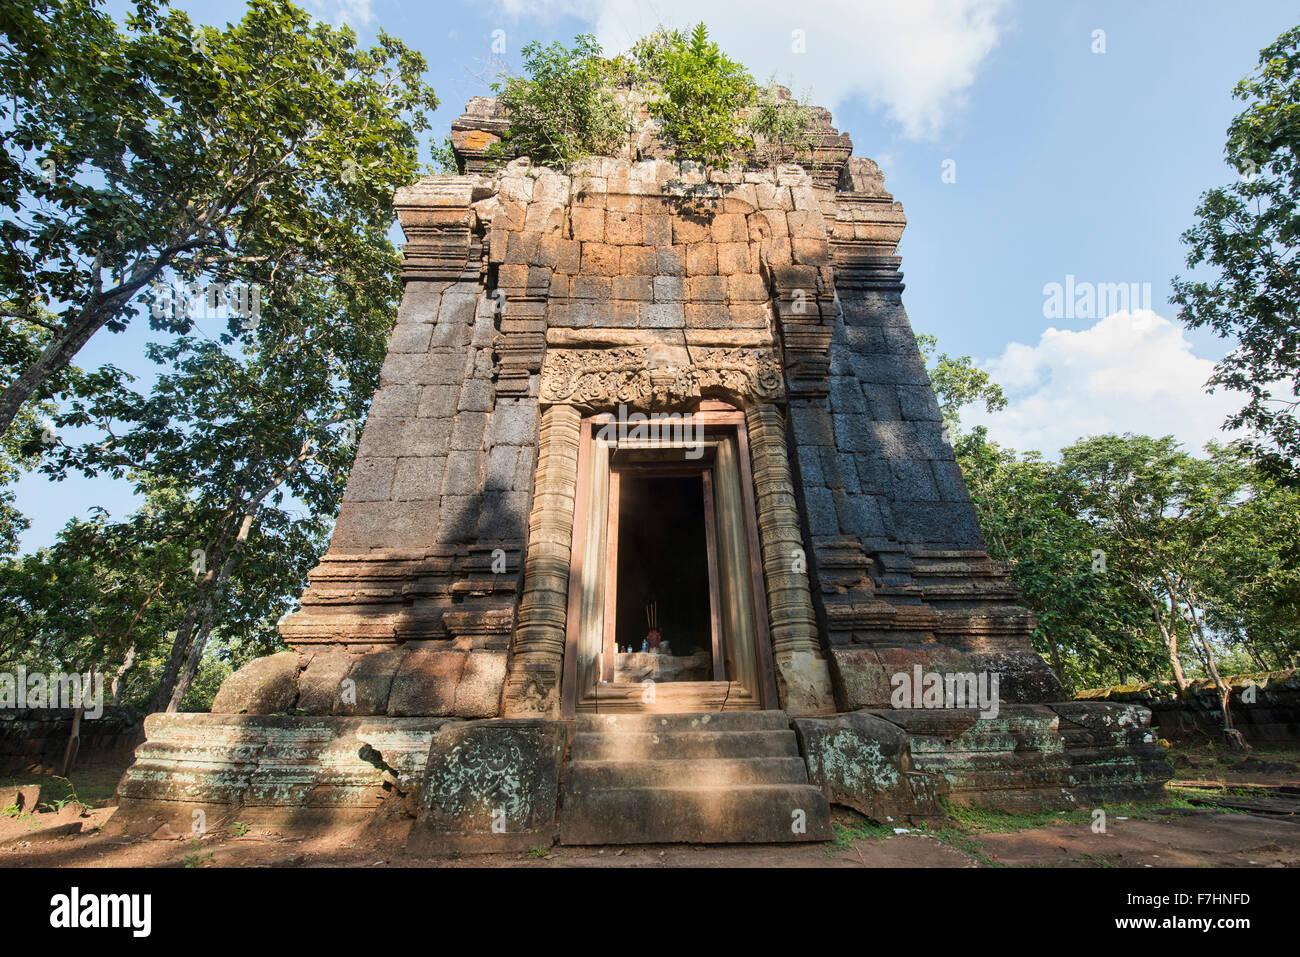 The hidden jungle temple of Prasat Neang Khmau at Koh Ker, Siem Reap, Cambodia - Stock Image